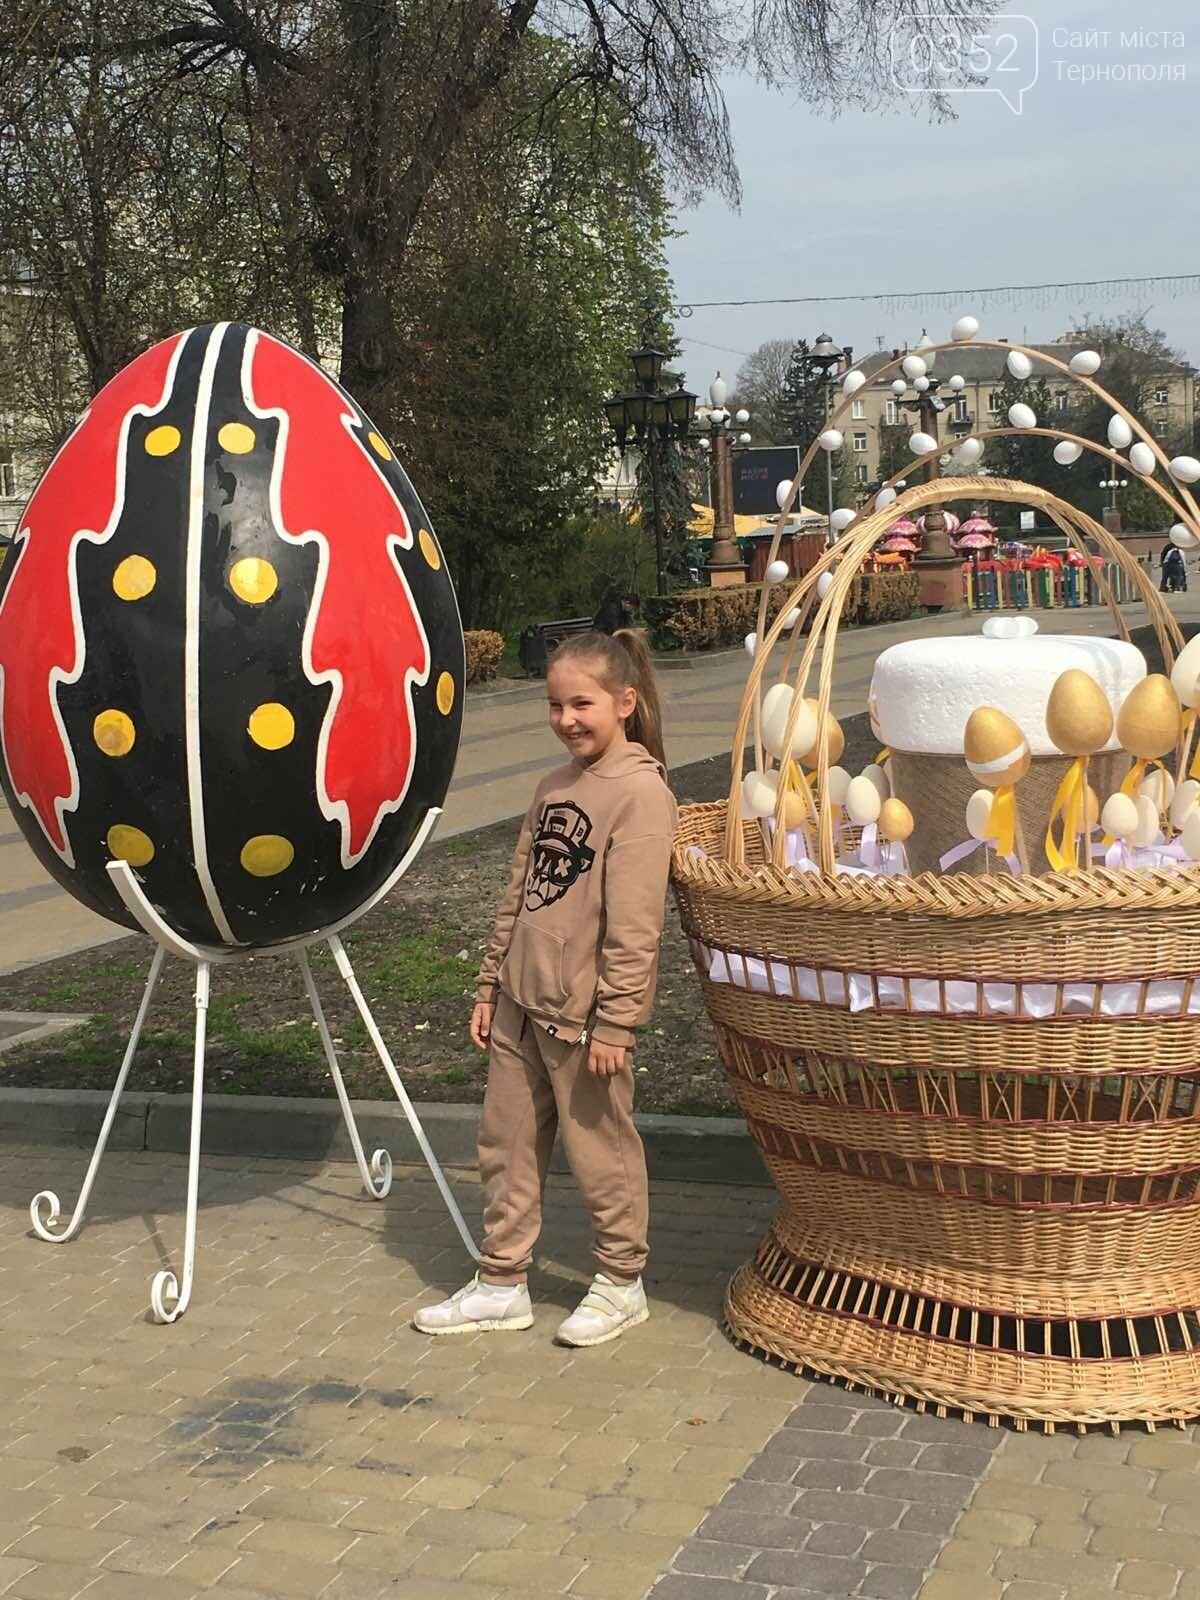 """Нова святкова фотозона"": в Тернополі на вулиці встановили великі кошики та писанки (ФОТО), фото-2"